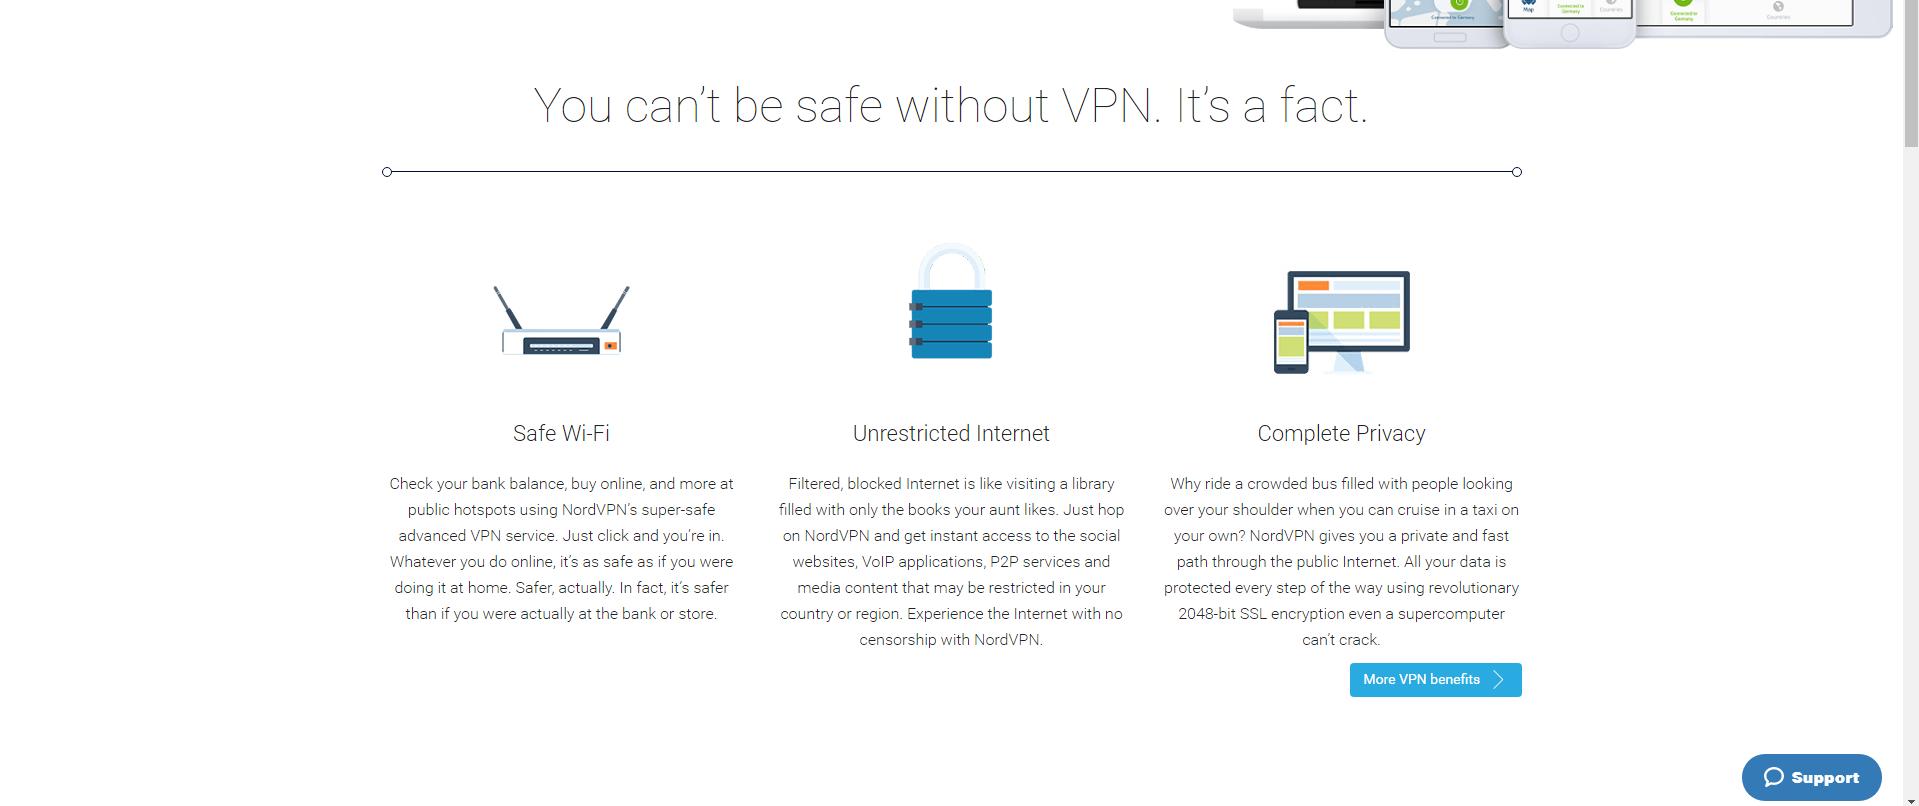 Best private internet service provider